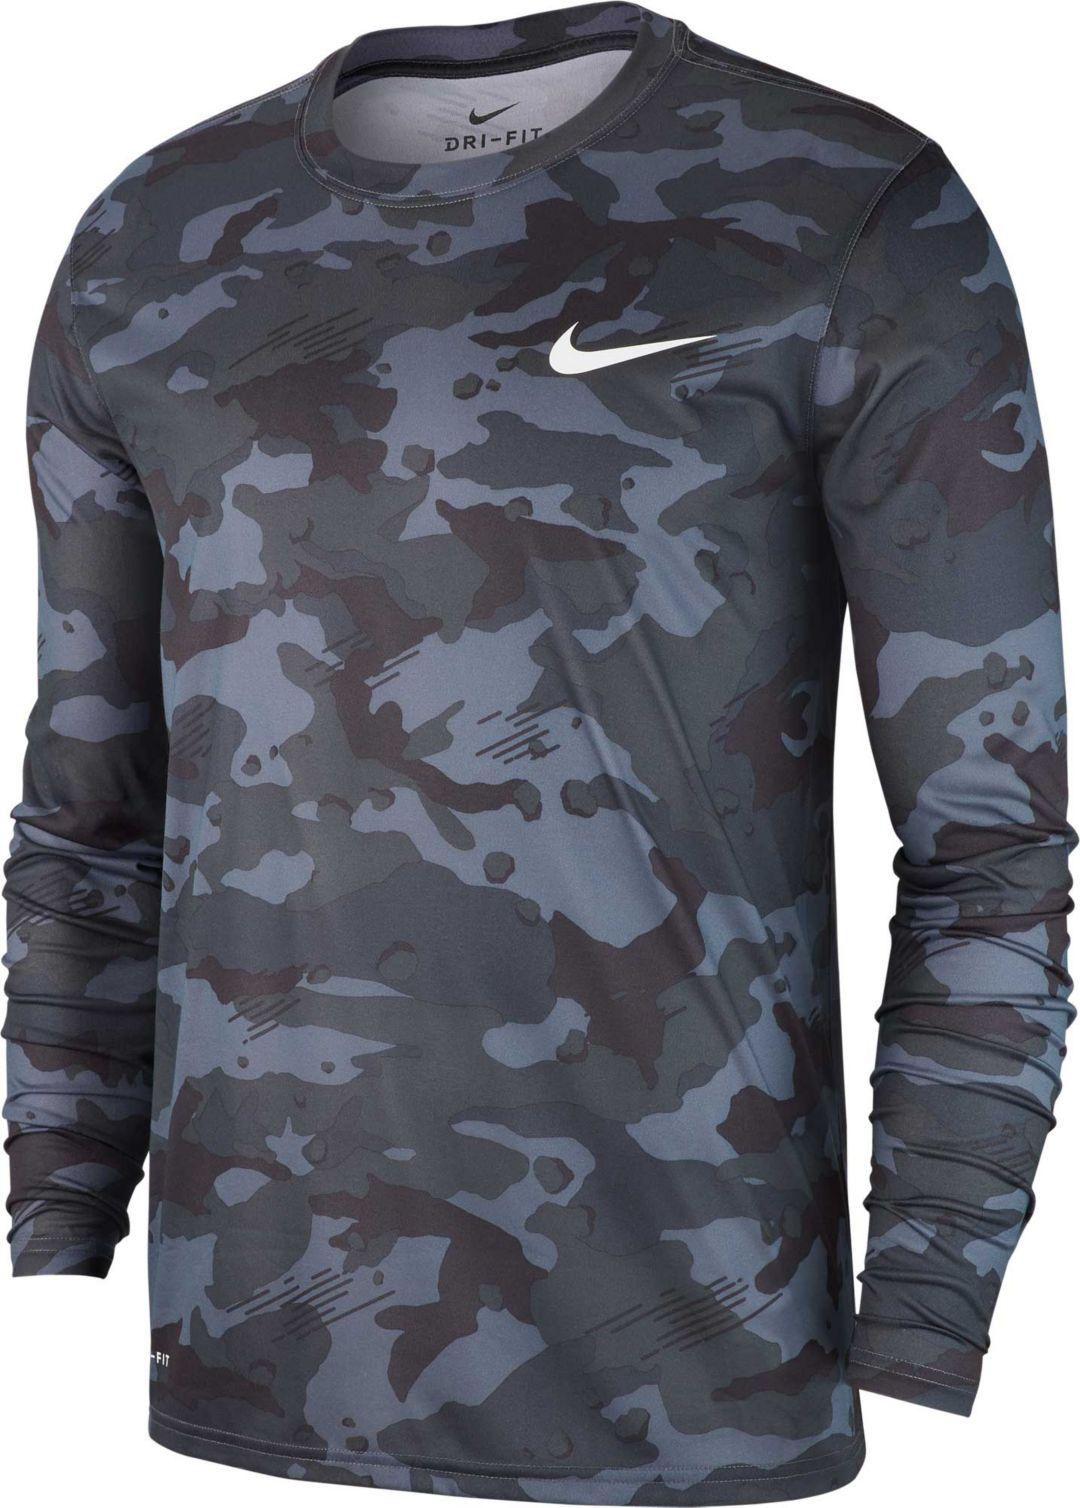 c5f7964028eb Nike Men's Dry Legend Camo Long Sleeve Tee | DICK'S Sporting Goods